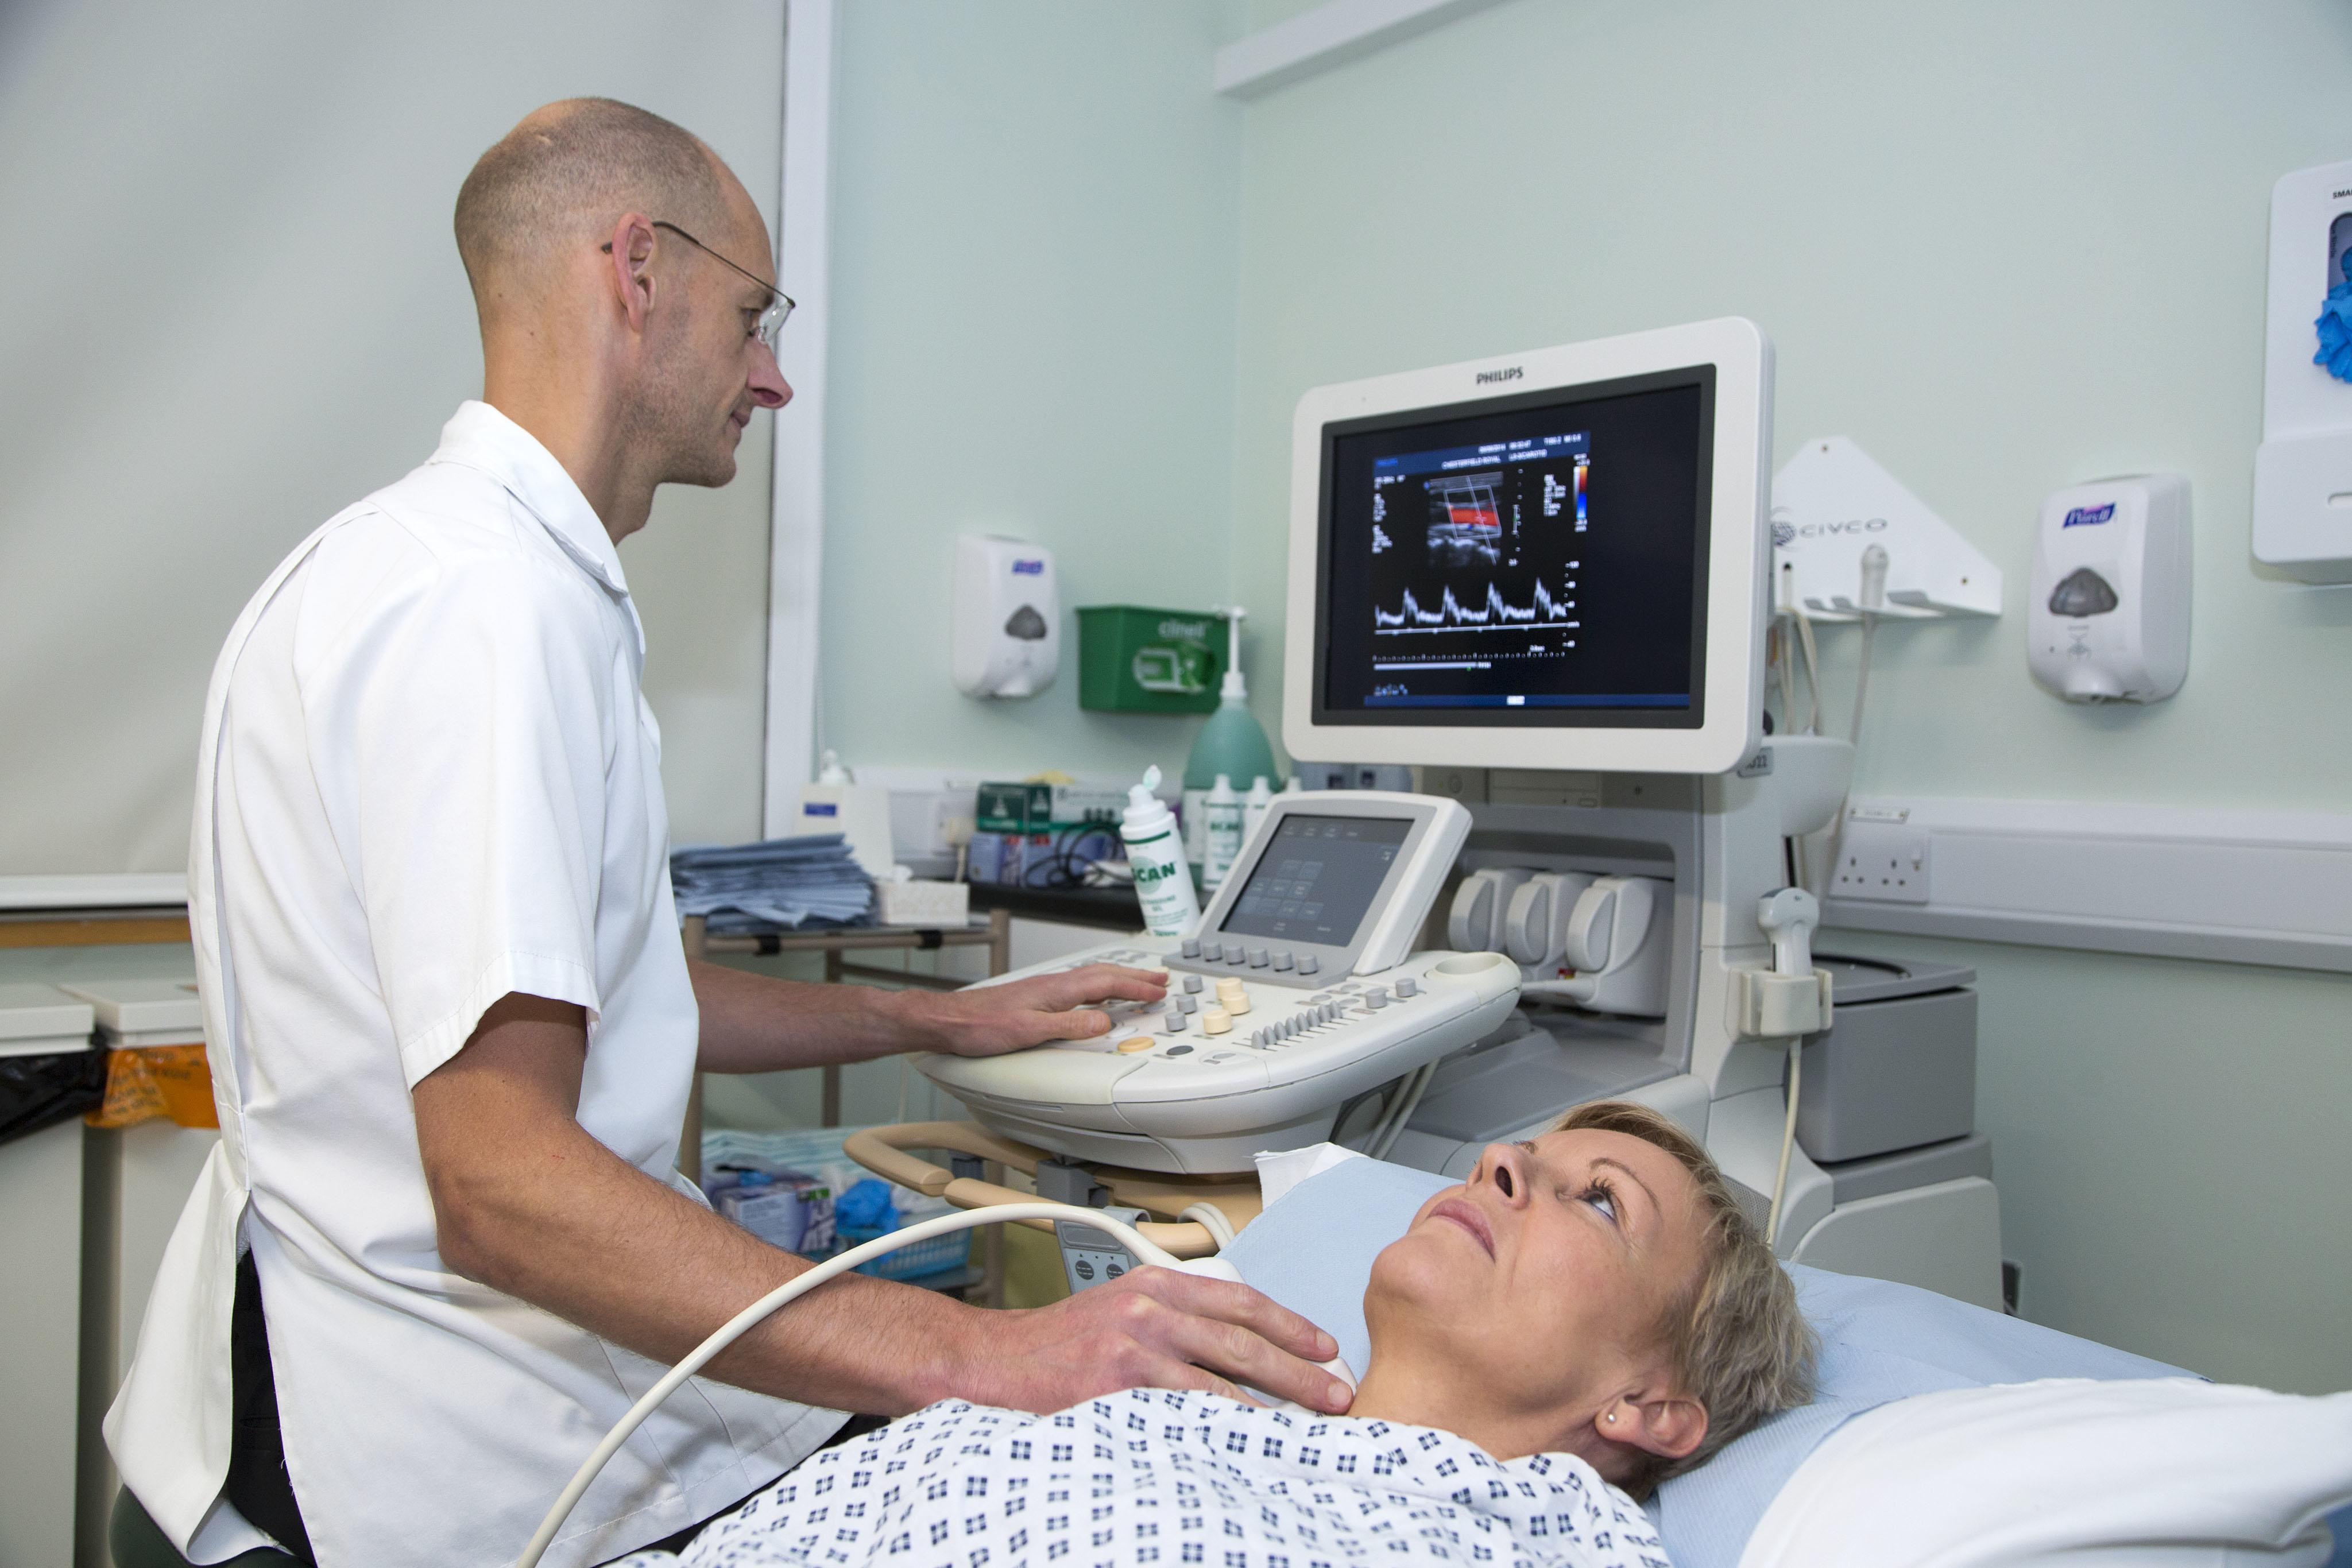 Ultrasound examination